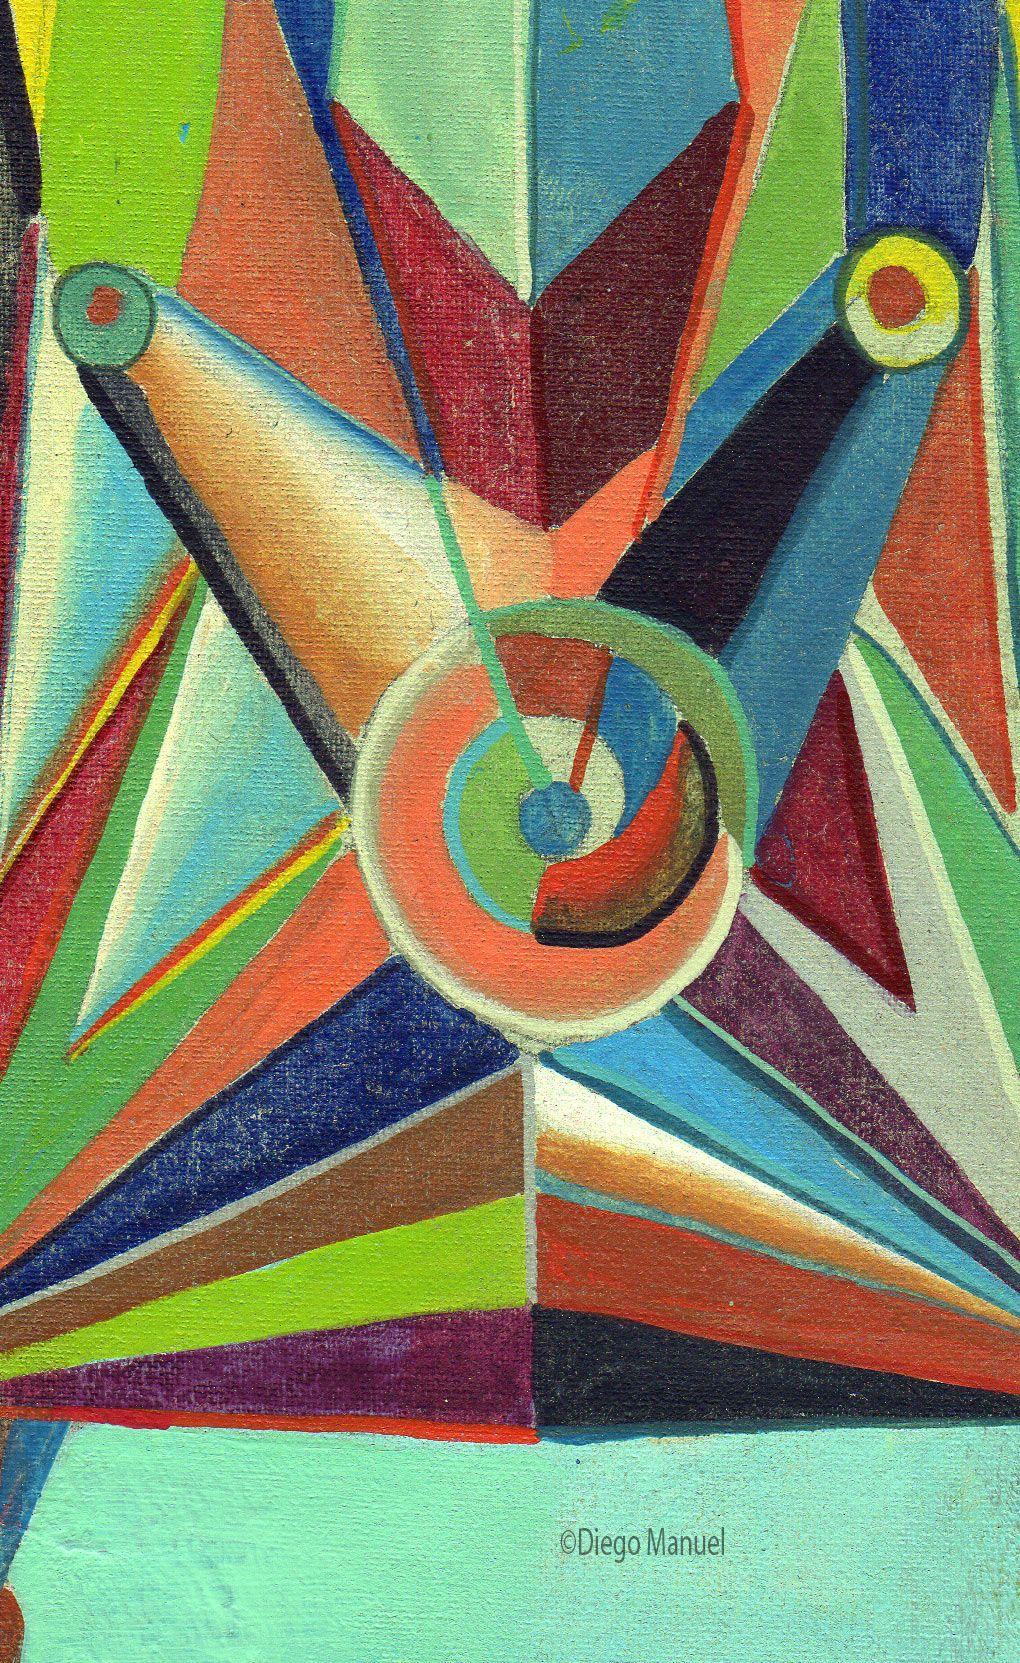 Astrapop 23, acrílico sobre tela, 27,5 x 17 cm. 2015. Abstract colorful painting